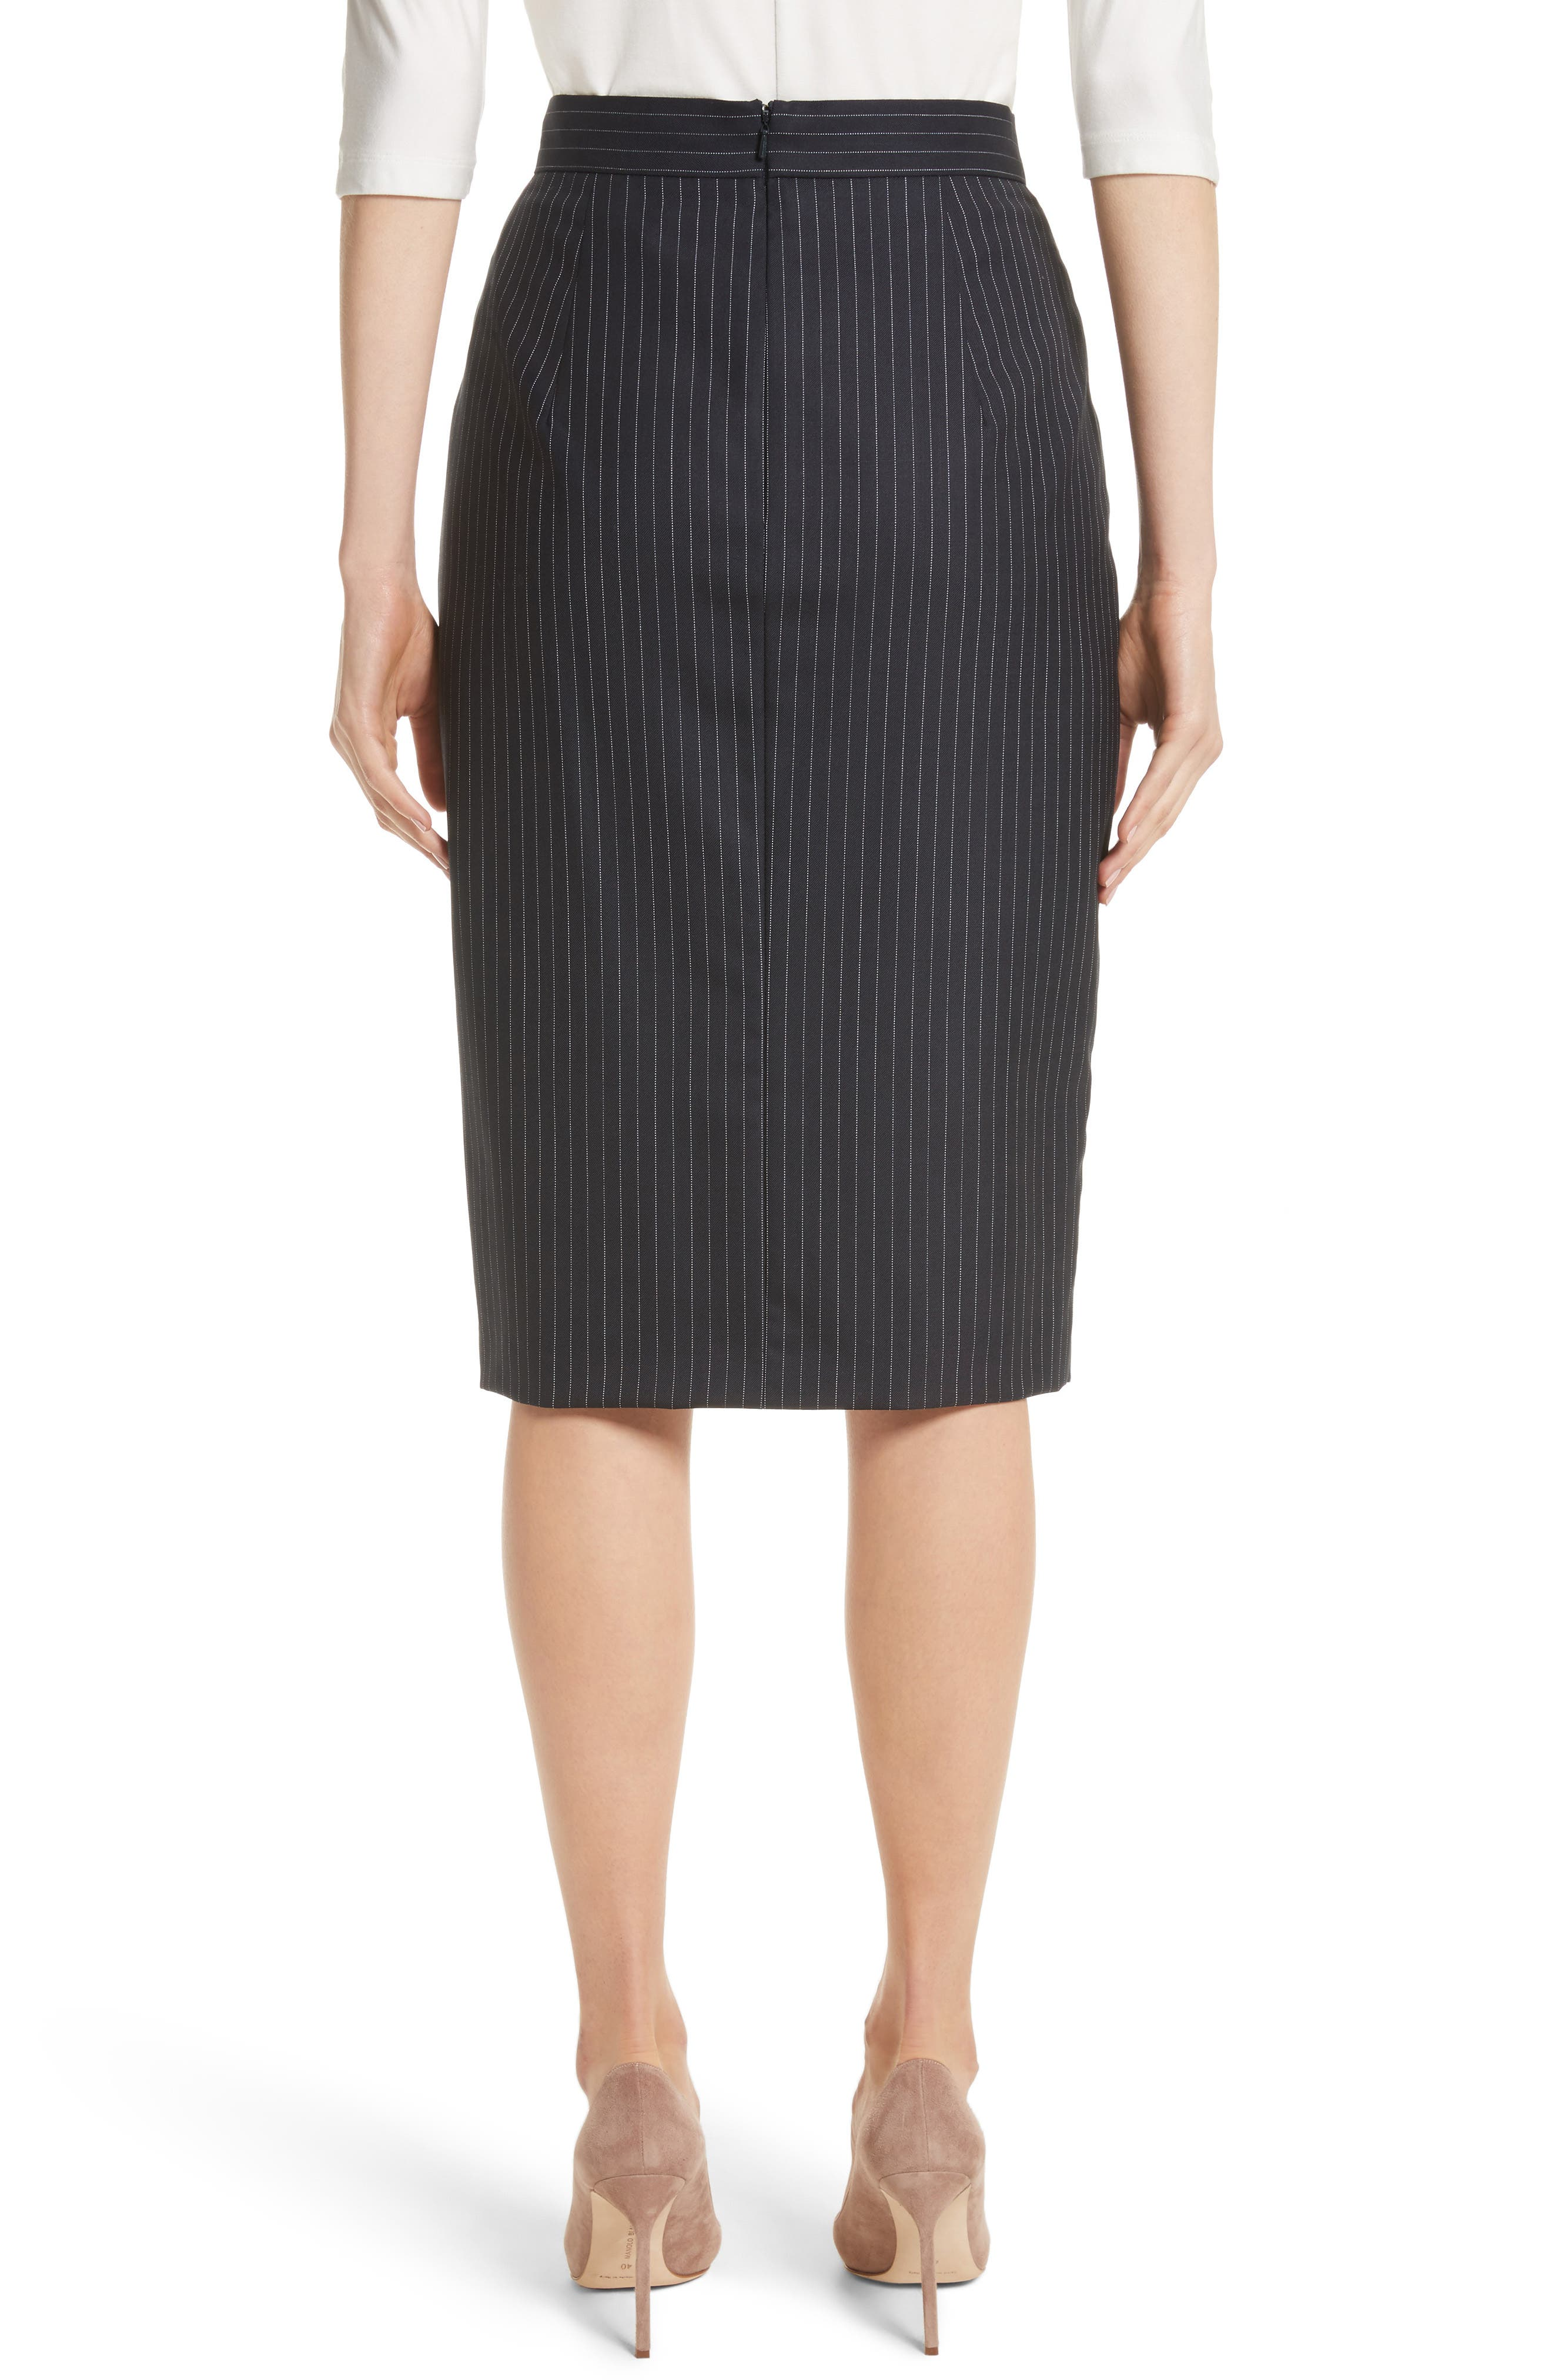 Abba Pinstripe Pencil Skirt,                             Alternate thumbnail 2, color,                             411